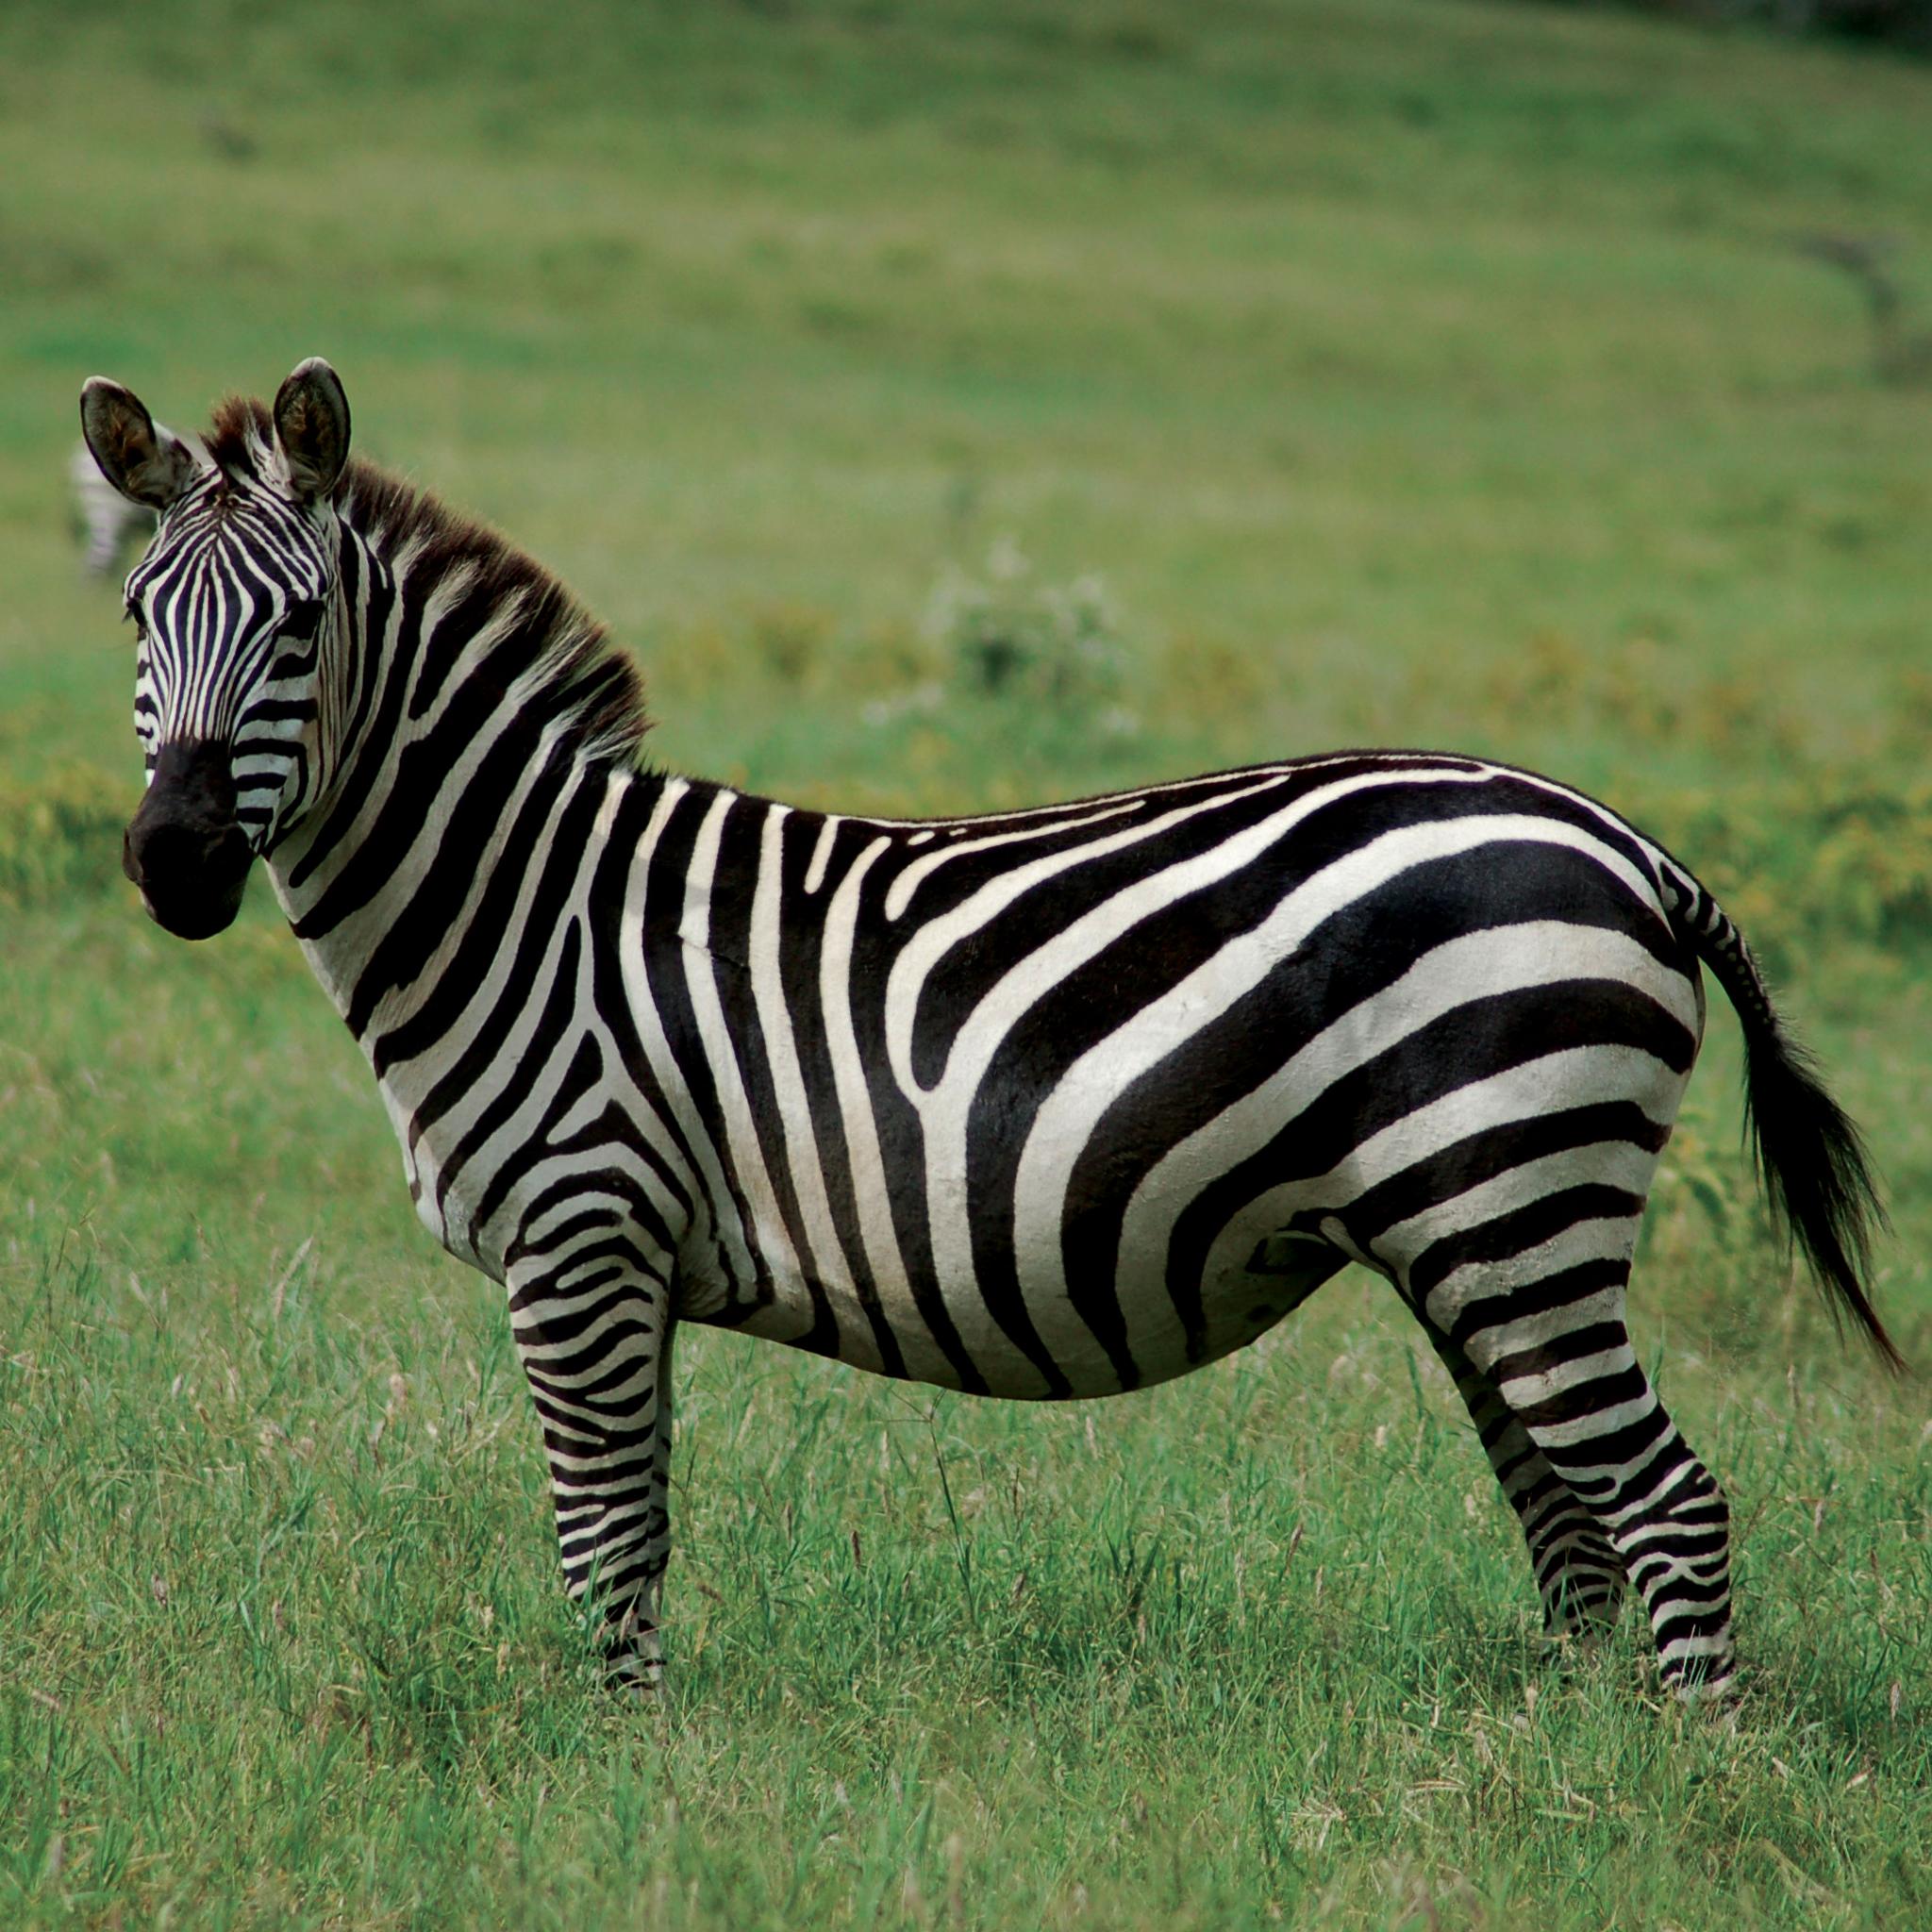 Zebra 3Wallpapers ipad Retina Zebra   iPad Retina